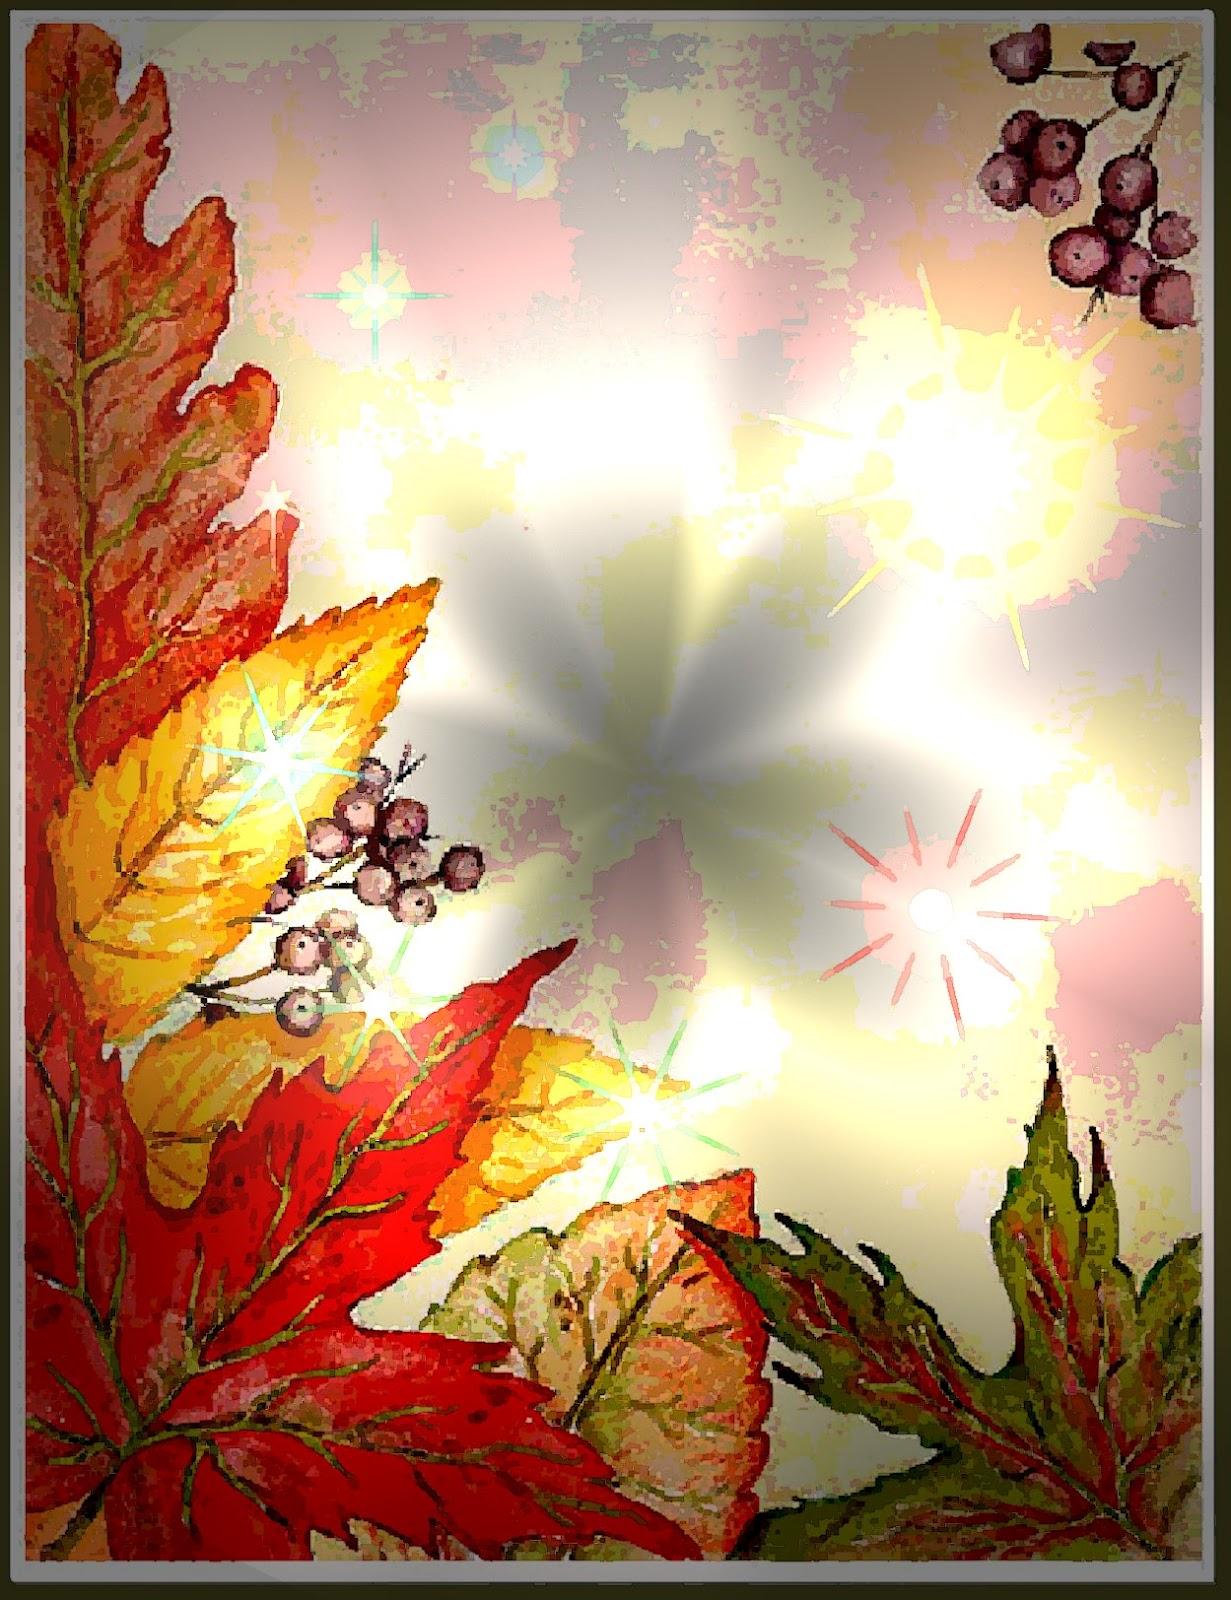 christian fall wallpaper - photo #5